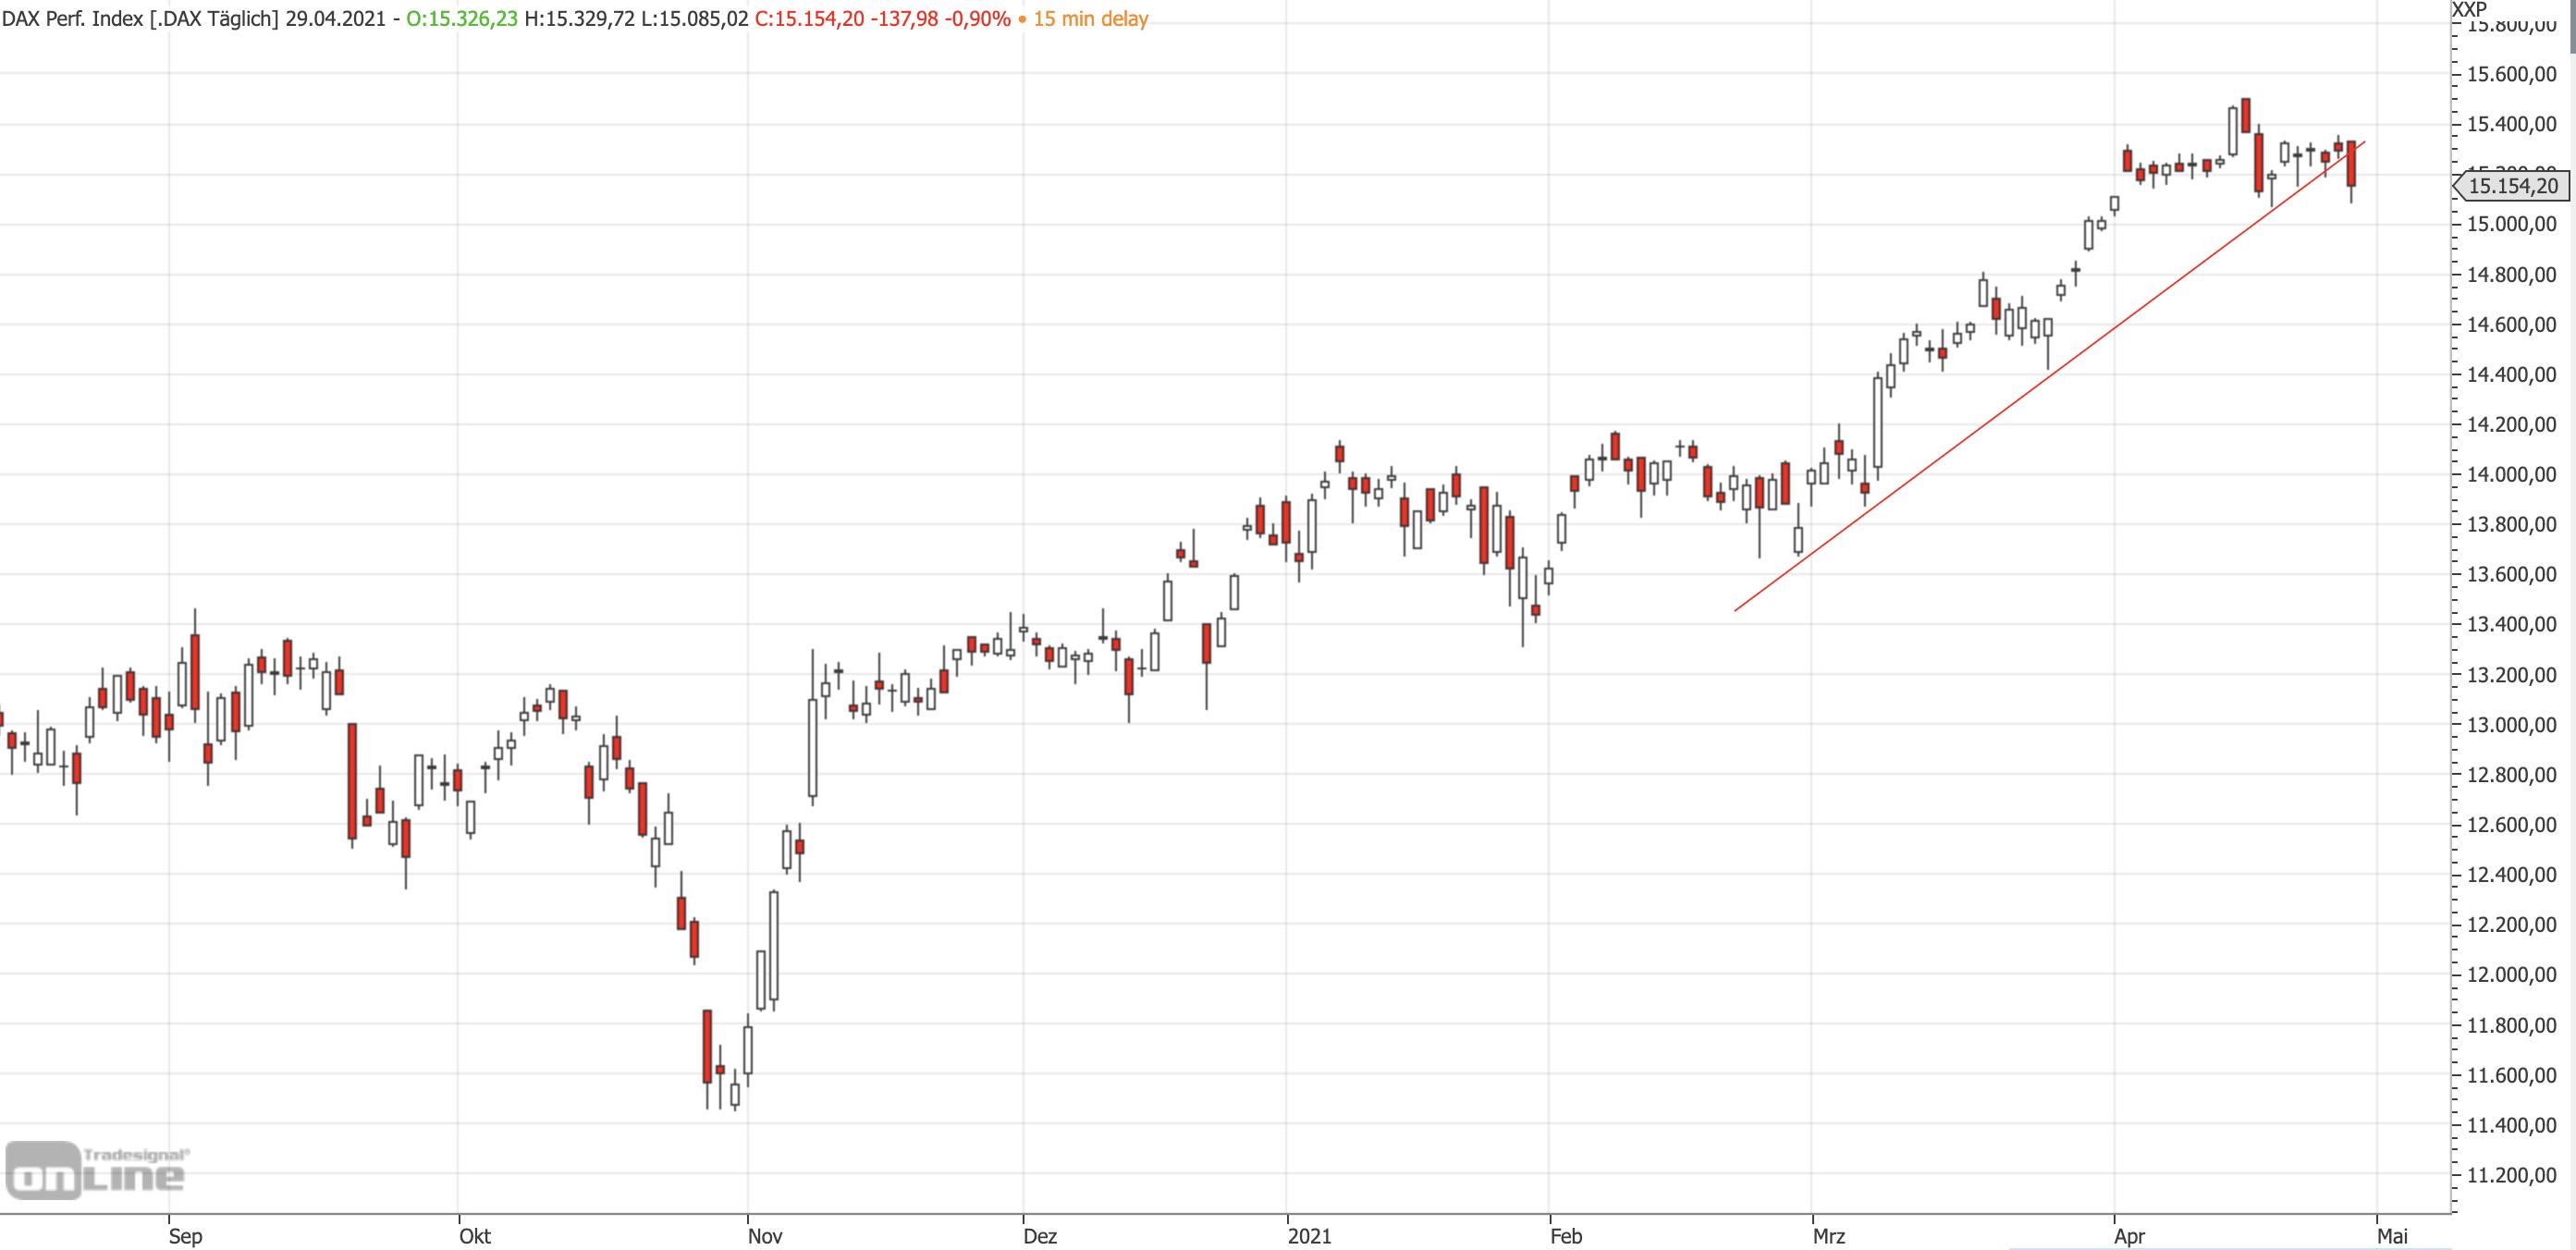 Mittelfristiger DAX-Chart am 29.04.2021